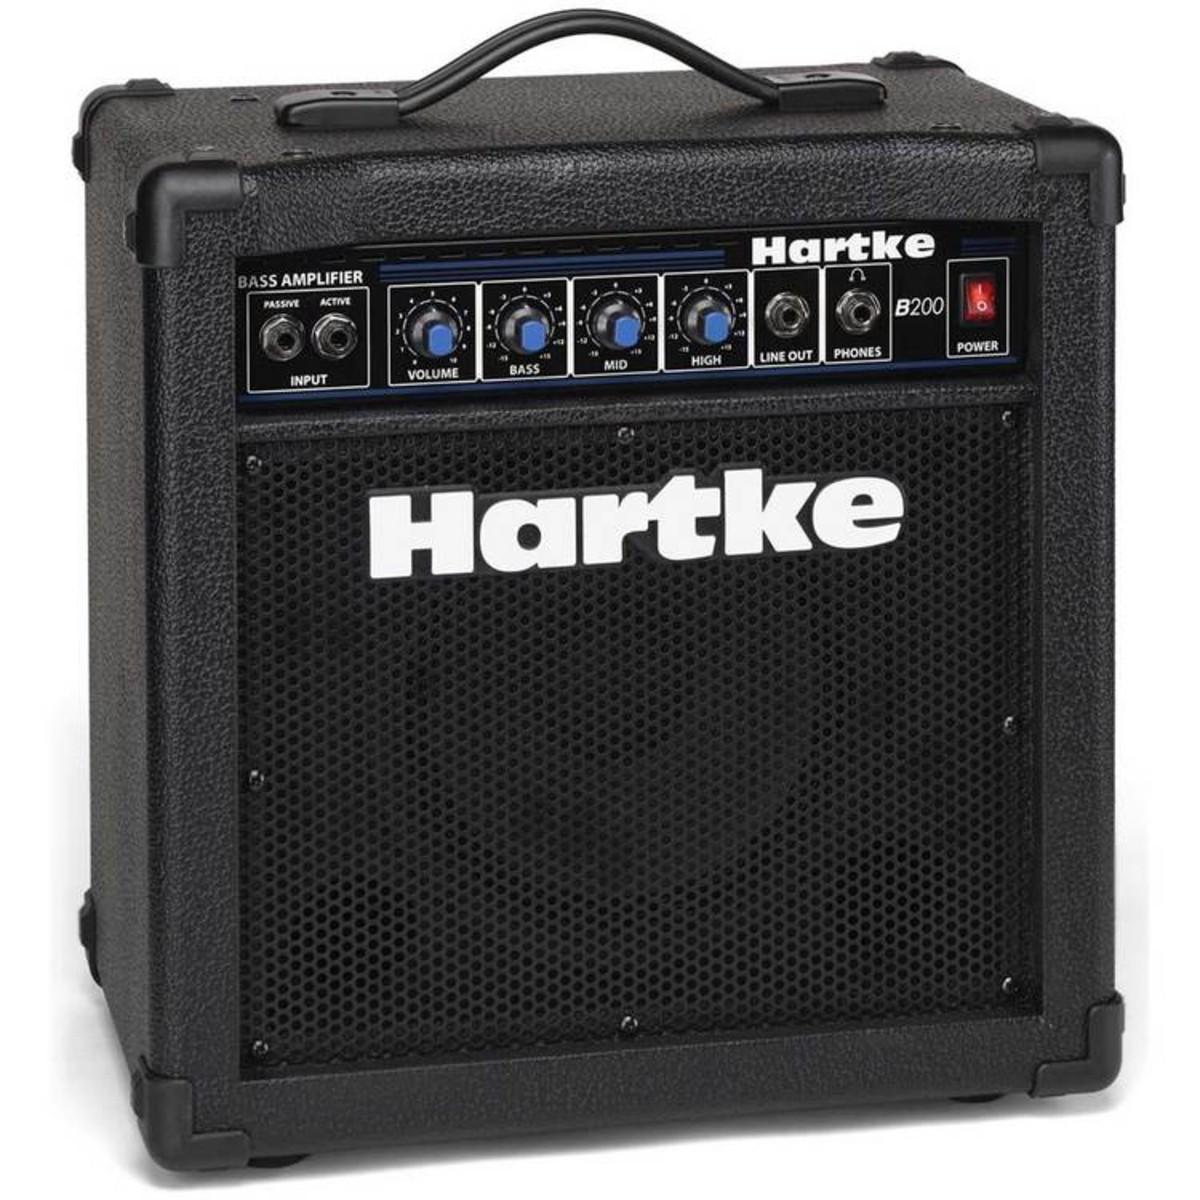 Disc Hartke B200 20w Bass Amp Combo At Gear4music Audio Amplifier Hmb200 Loading Zoom